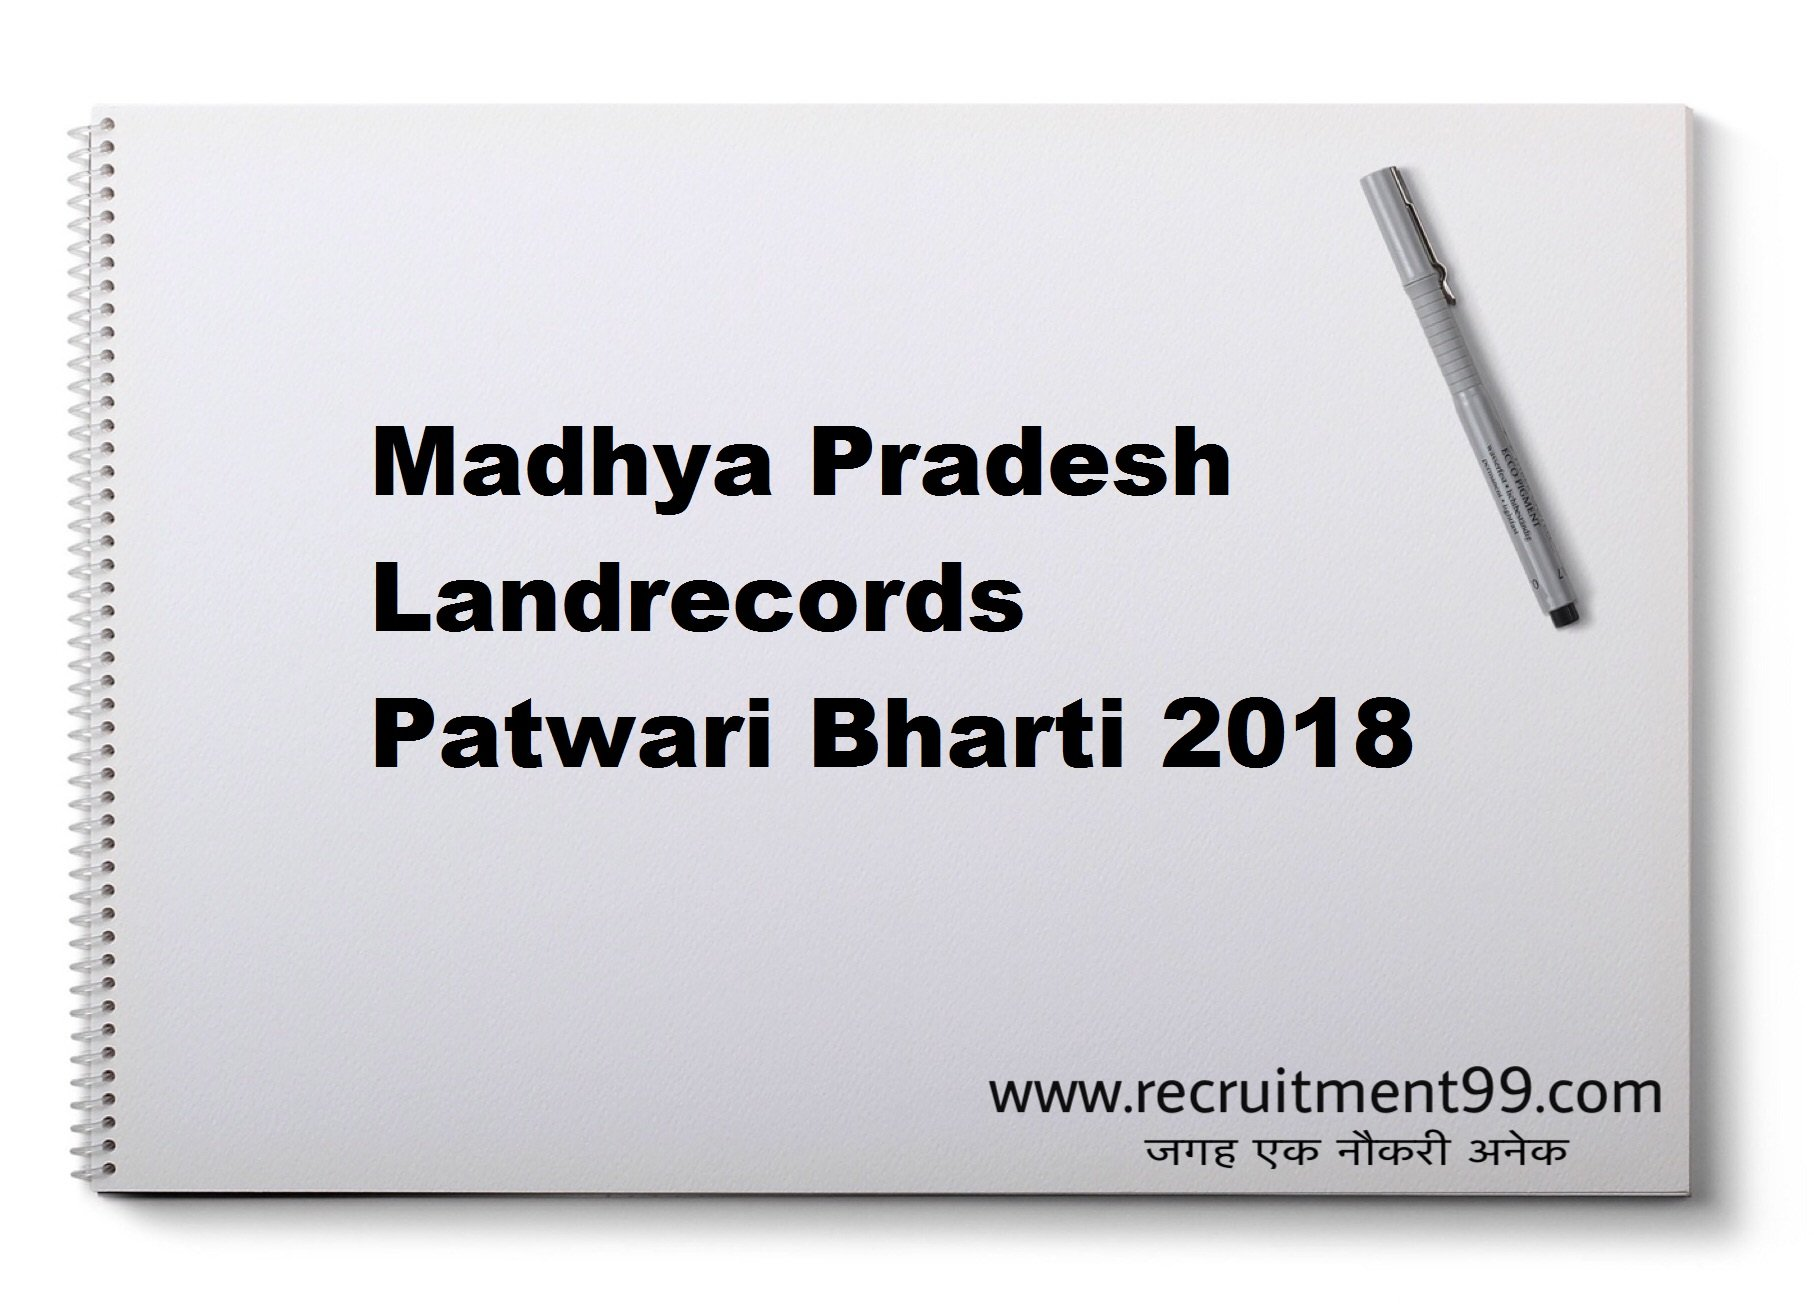 Madhya Pradesh Landrecords Patwari Bharti Admit Card Result 2018